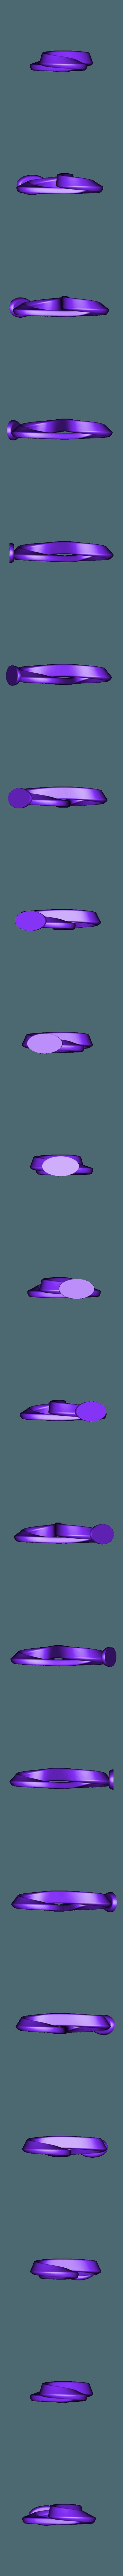 Mobius8.stl Download free STL file Mobius strip 8 castomisable in blender • Object to 3D print, Az3Dip